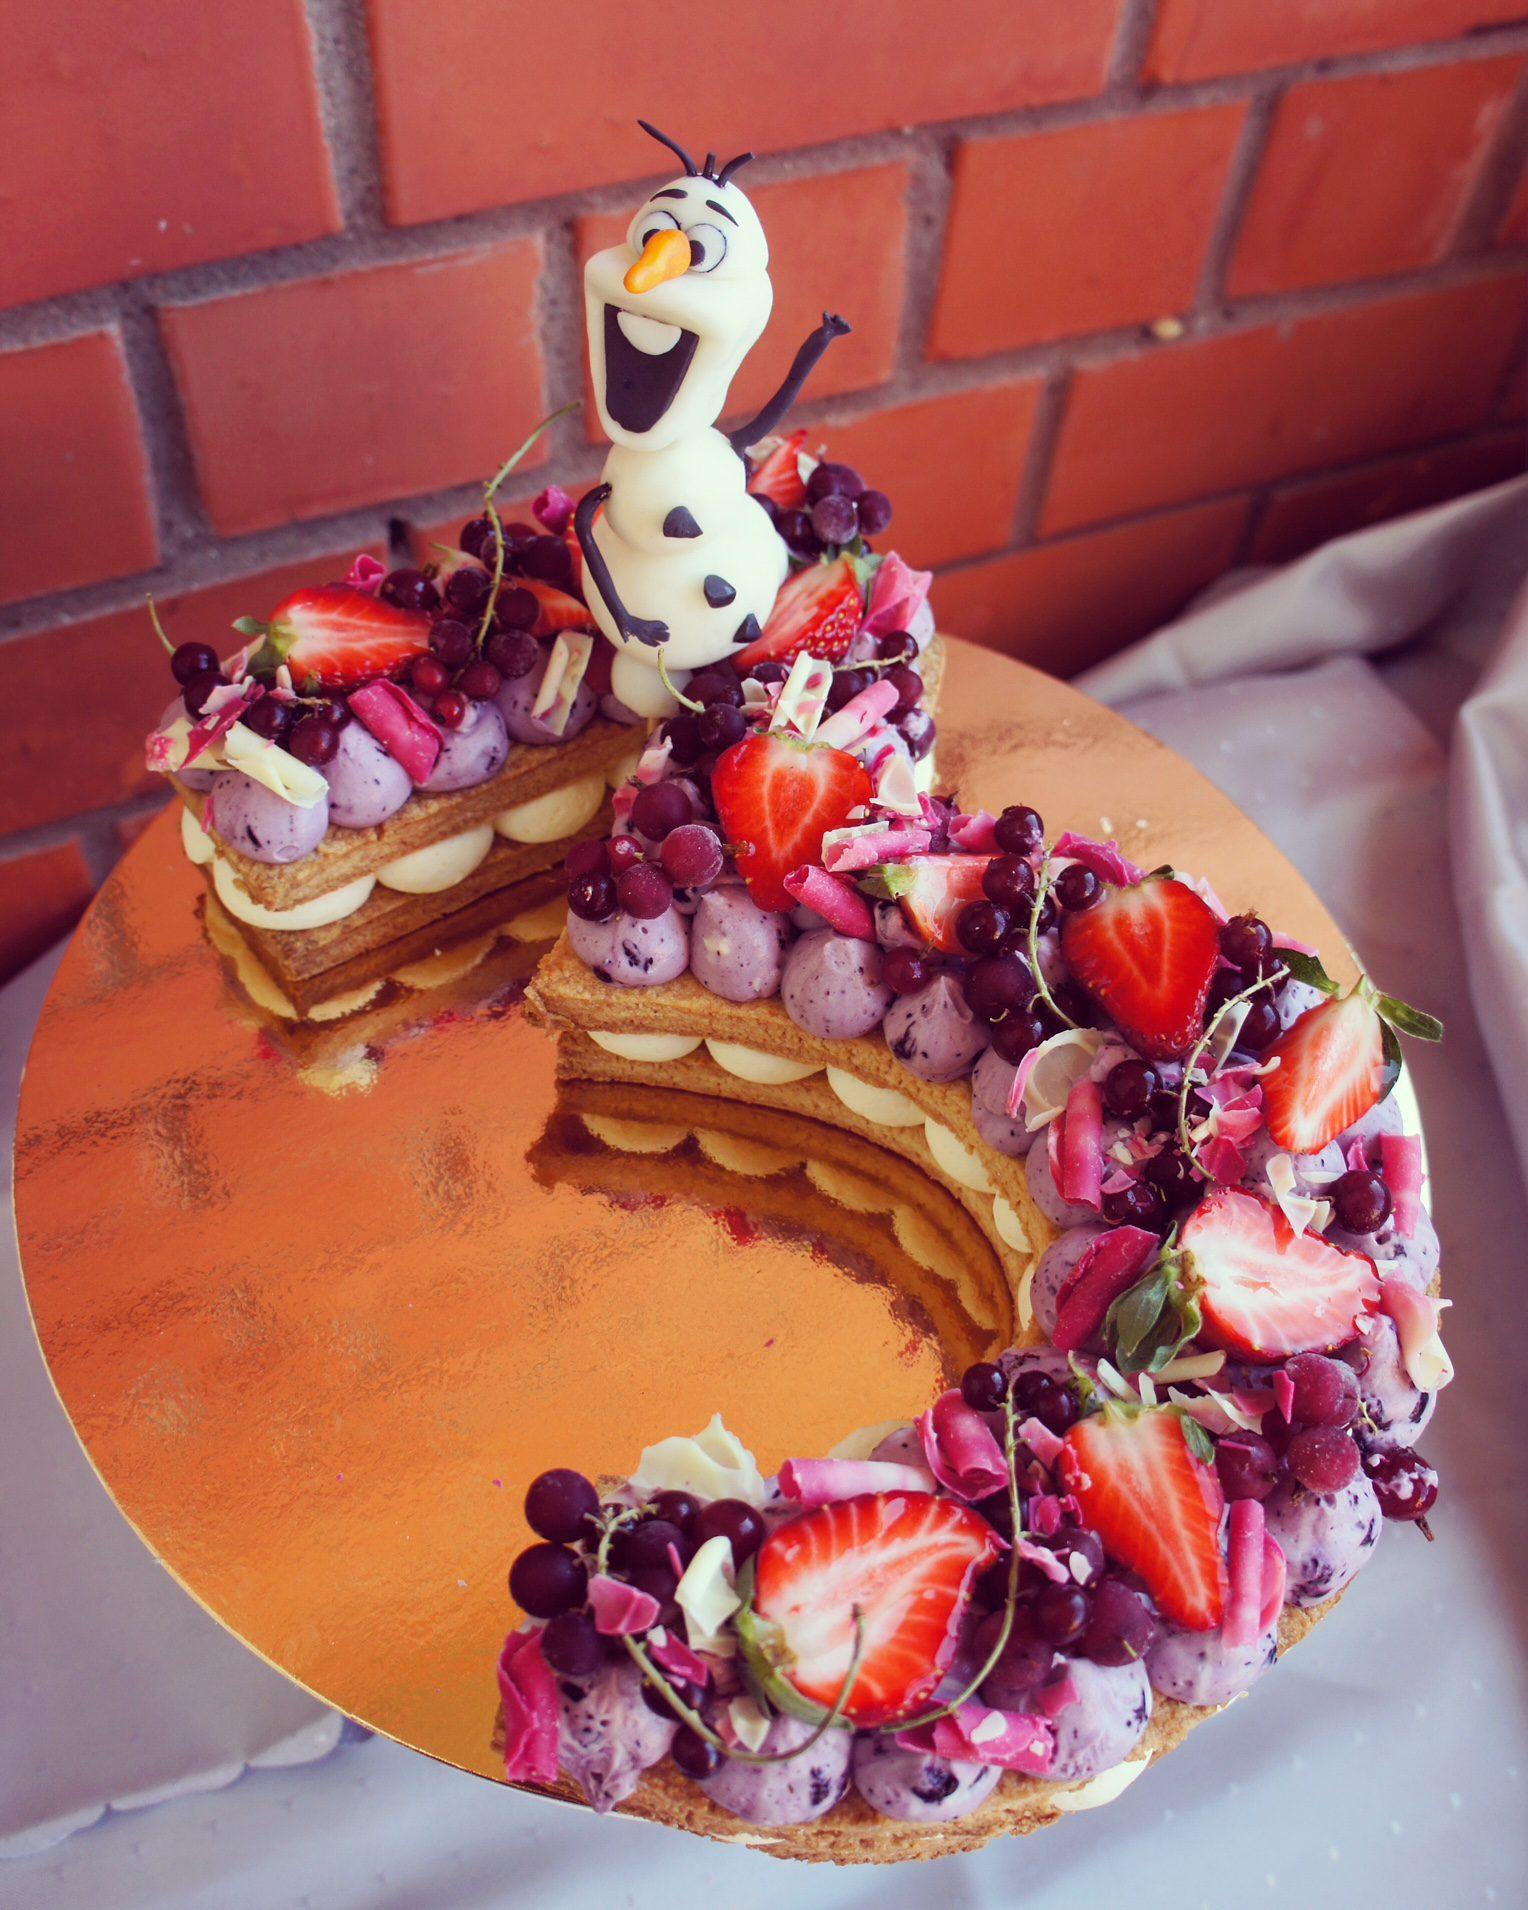 ciparburtu kūka ar Olafu